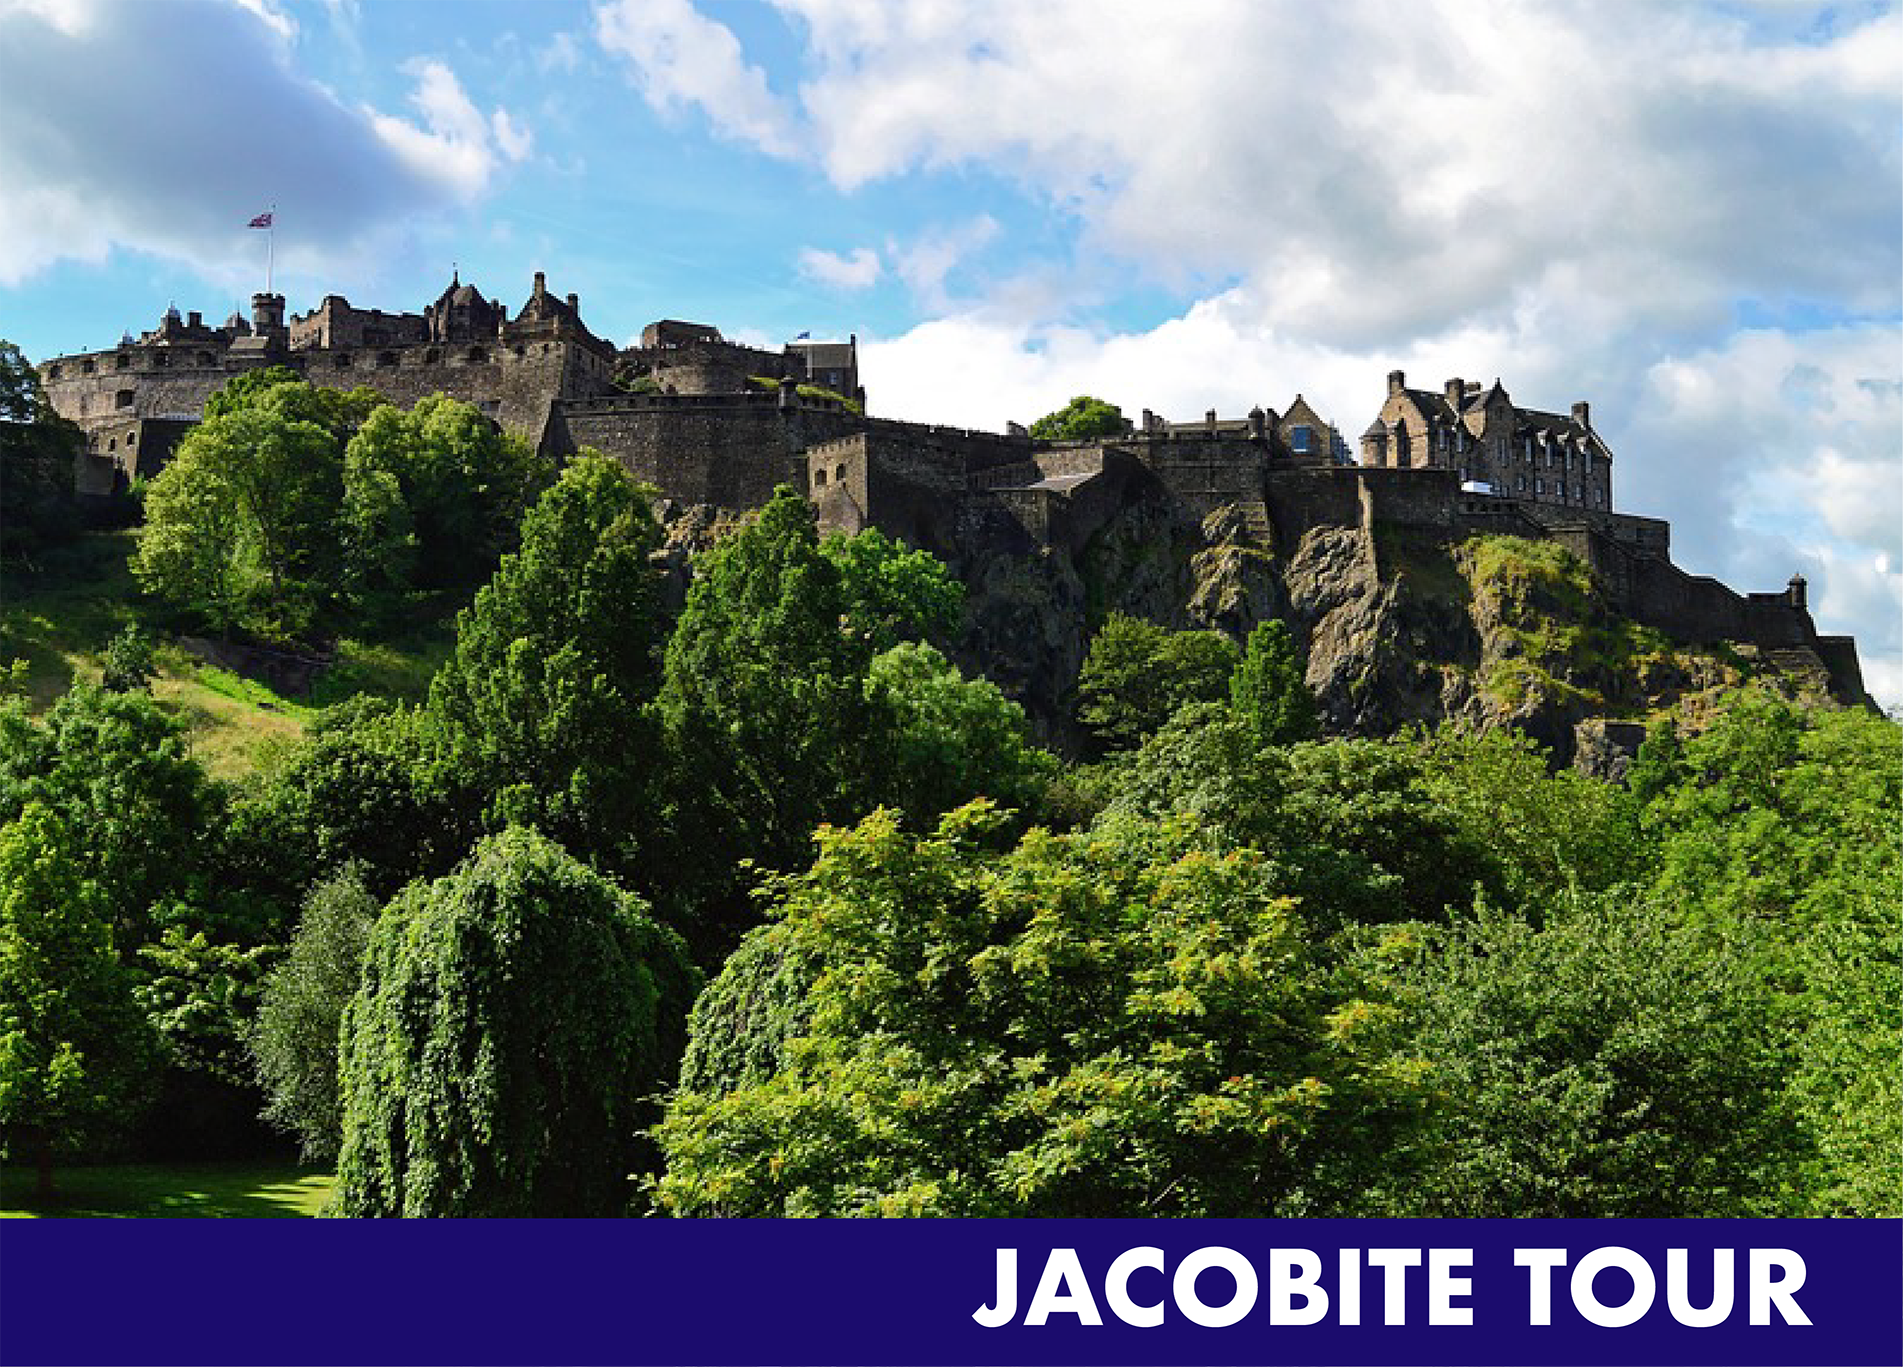 Jacobite-tour.png